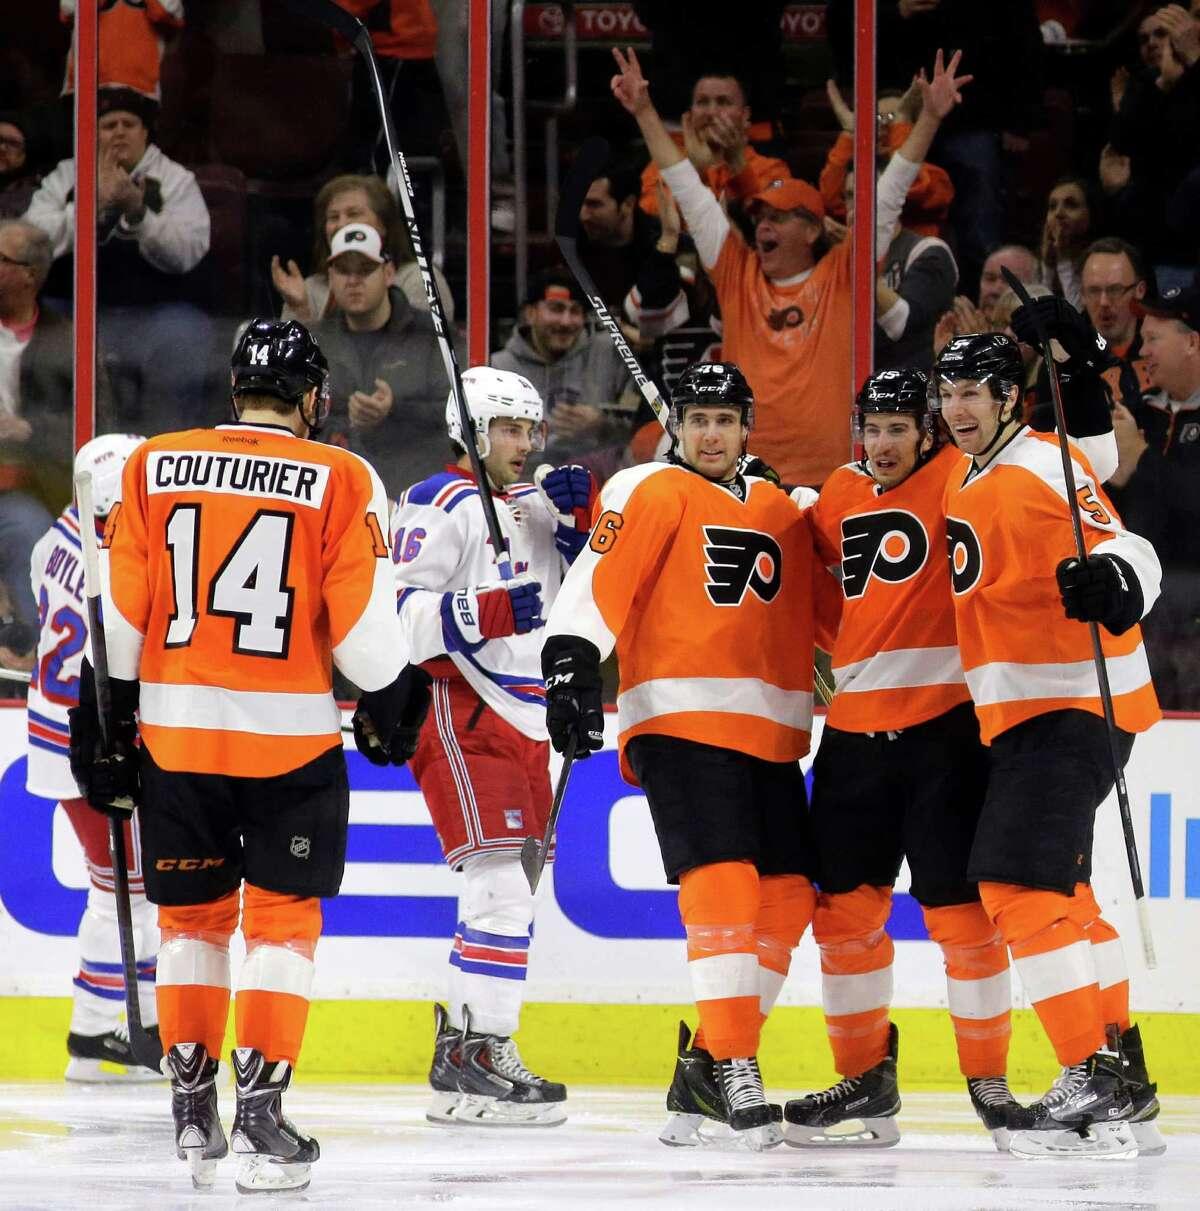 Philadelphia Flyers' Sean Couturier (14), Chris VandeVelde (76) Michael Del Zotto (15) and Braydon Coburn (5) celebrate after Del Zotto's go-ahead goal during the third period of an NHL hockey game against the New York Rangers, Saturday, Feb. 28, 2015, in Philadelphia. Philadelphia won 4-2. (AP Photo/Matt Slocum) ORG XMIT: PXC107